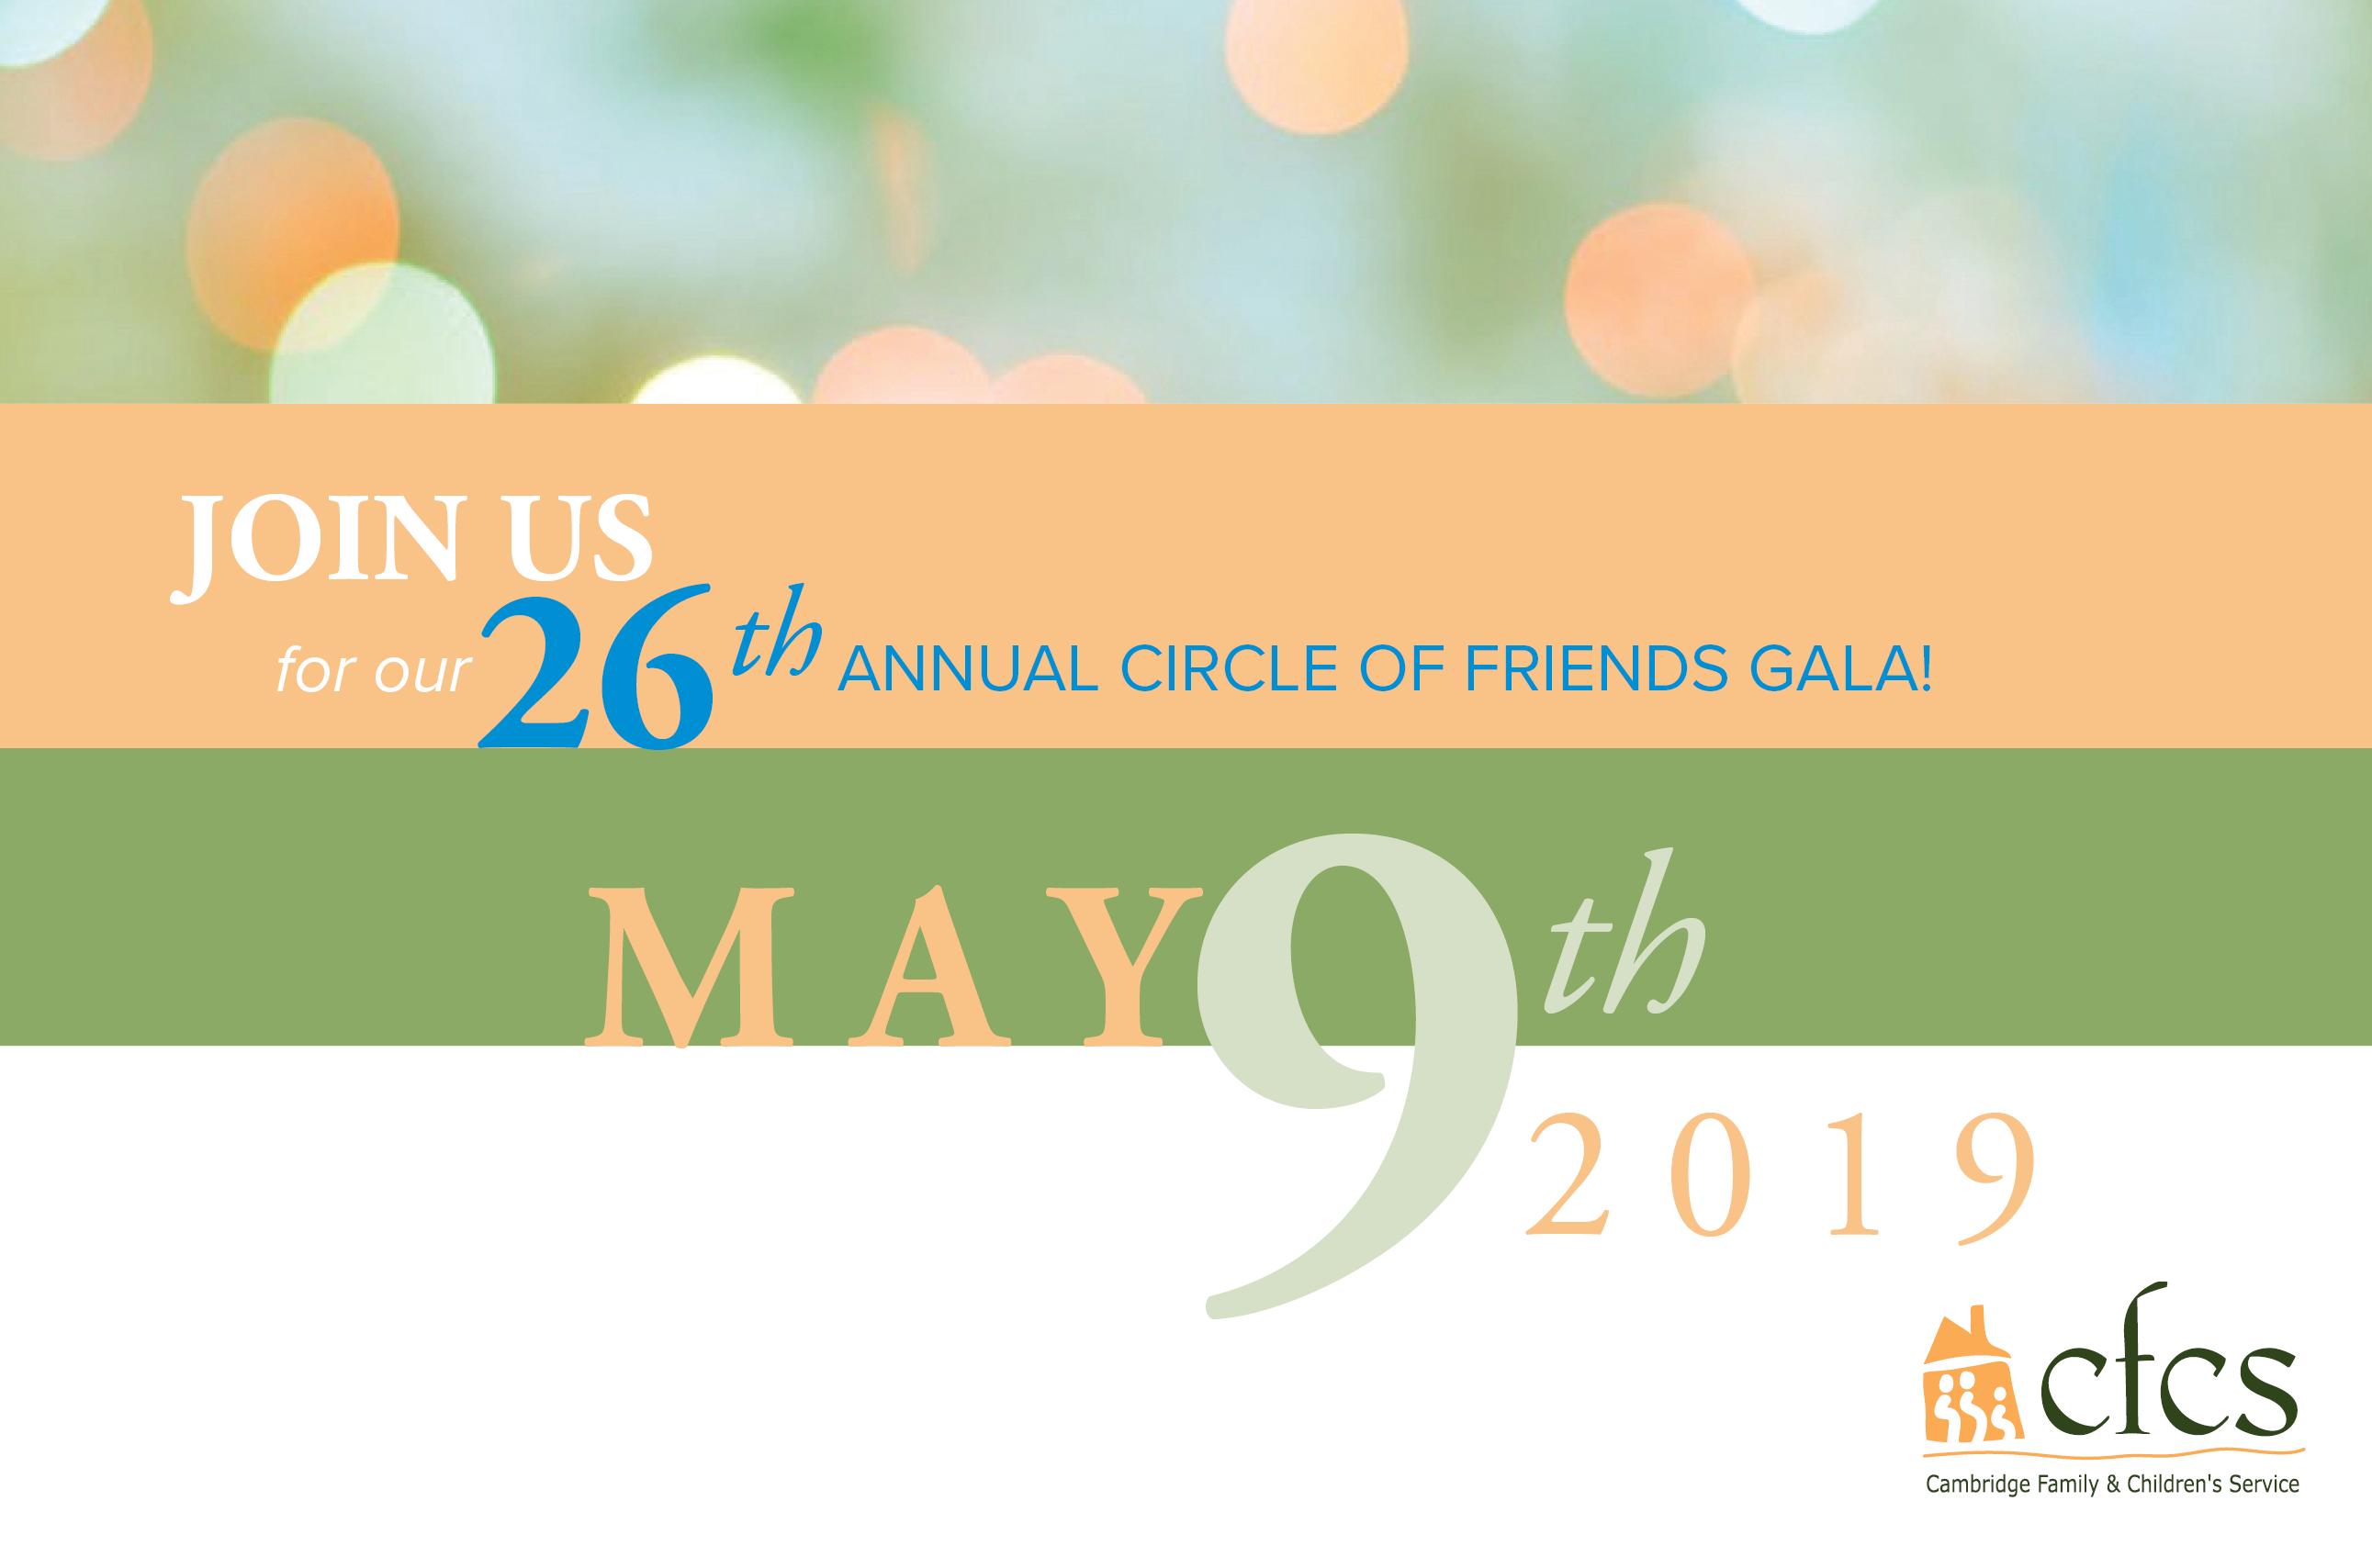 26th Annual Circle of Friends Gala